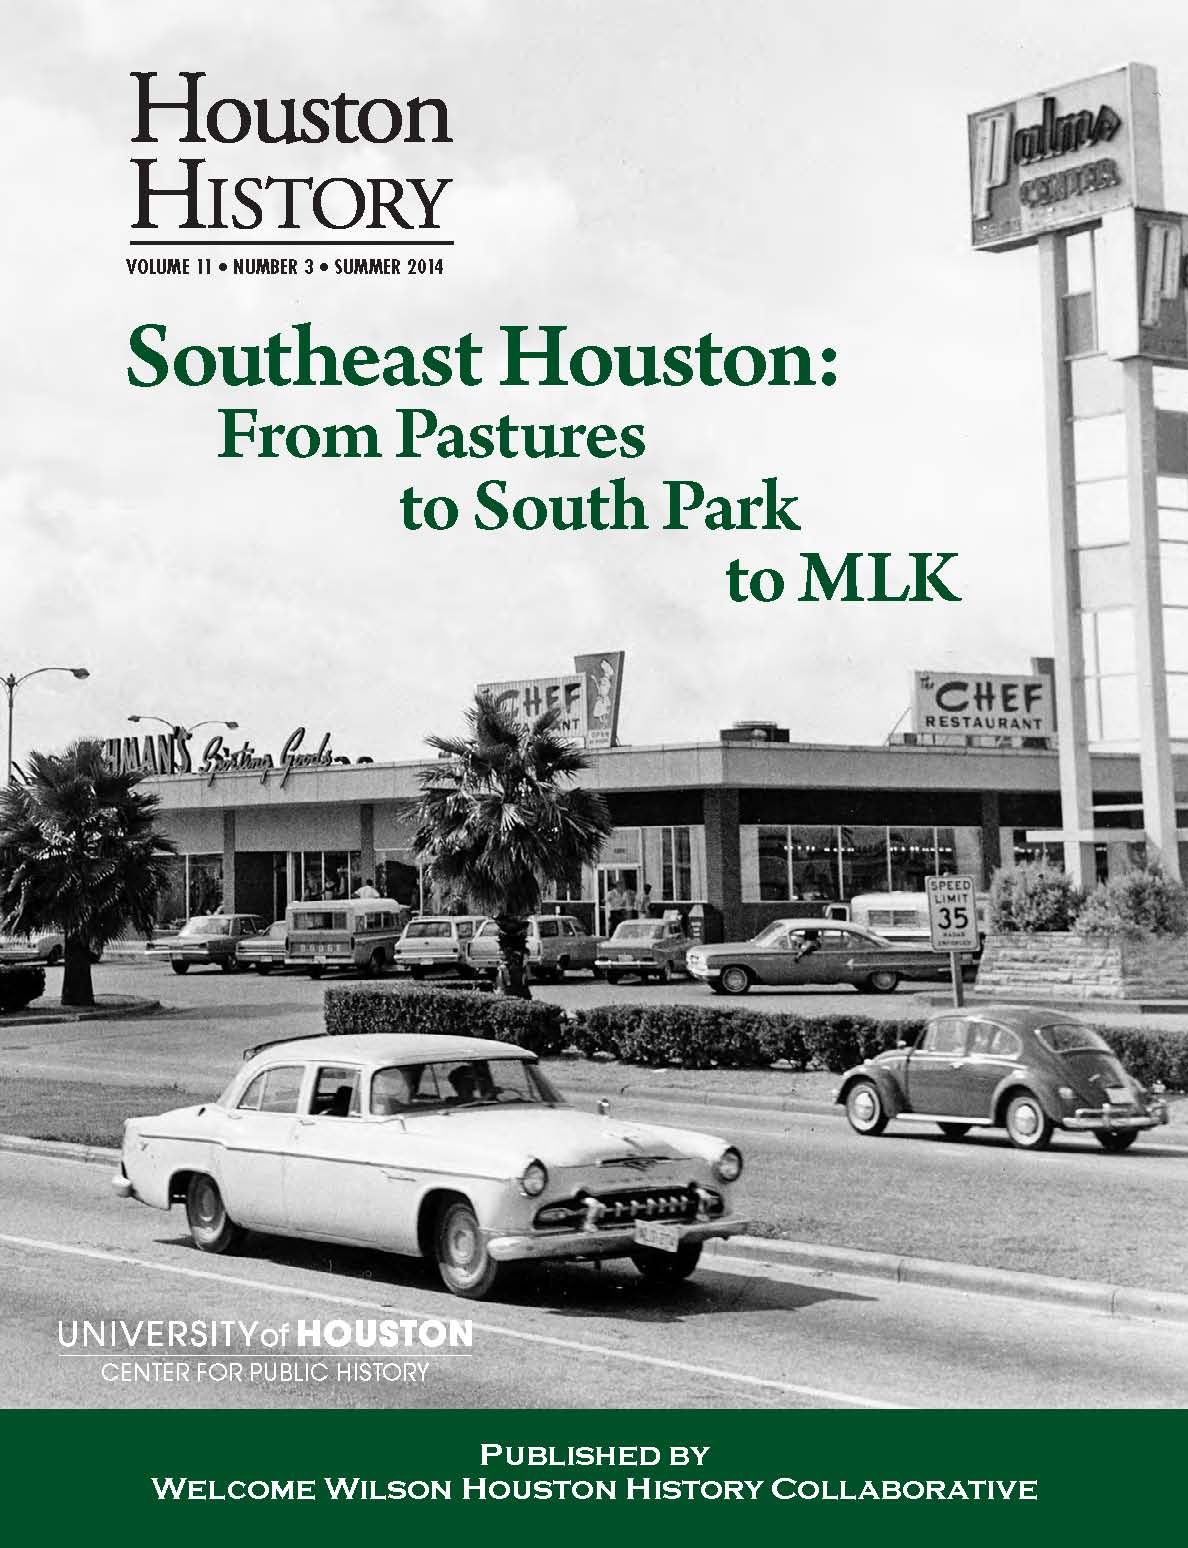 houston history: